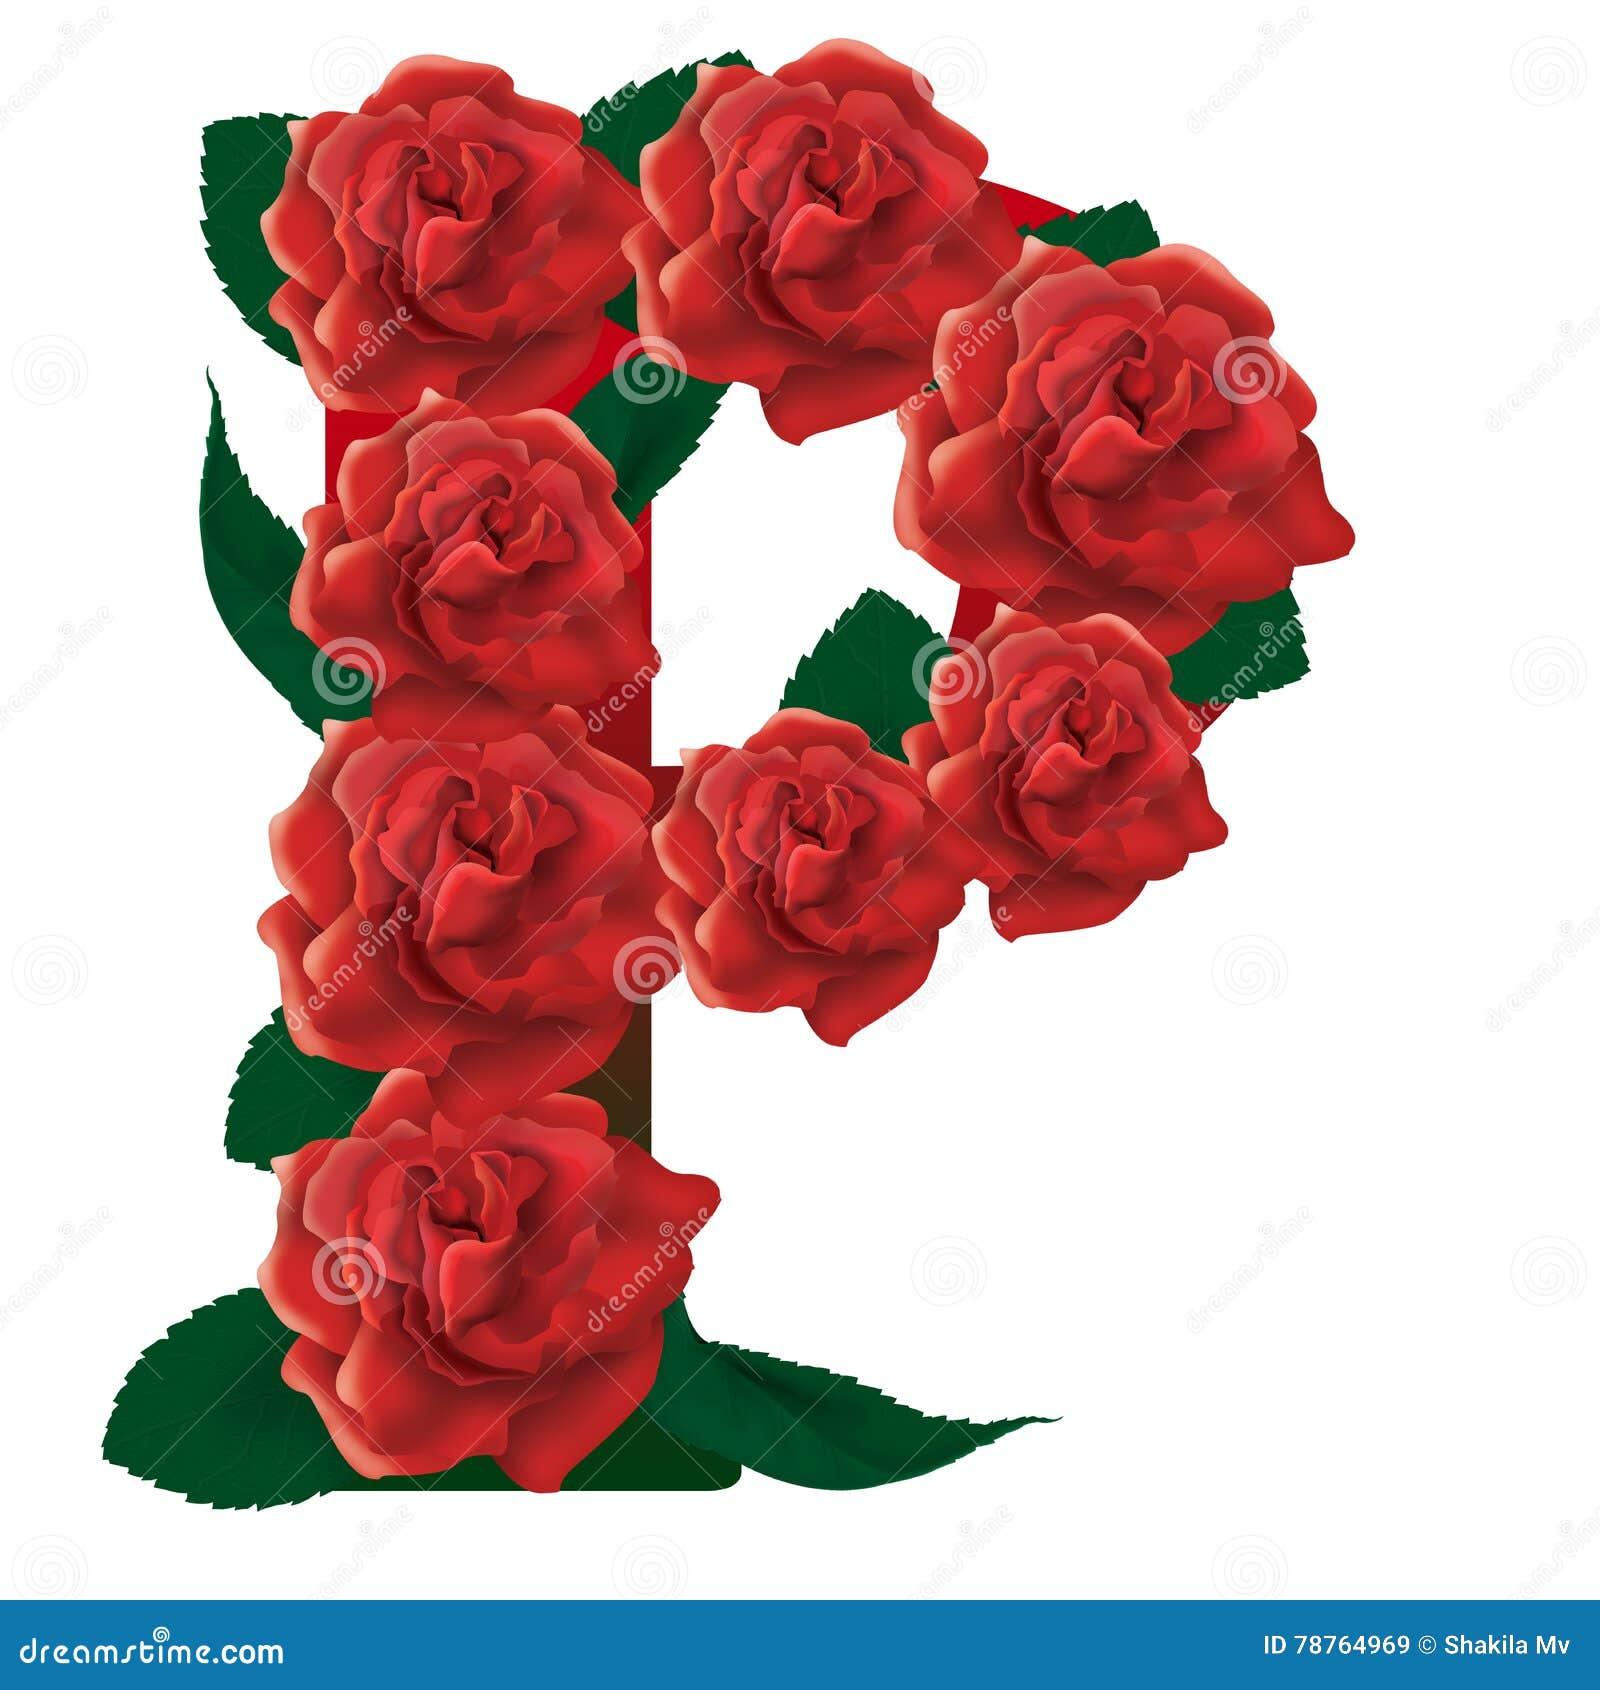 Letter P Red Roses Illustration Stock Image - Illustration of flowers, decor: 78764969